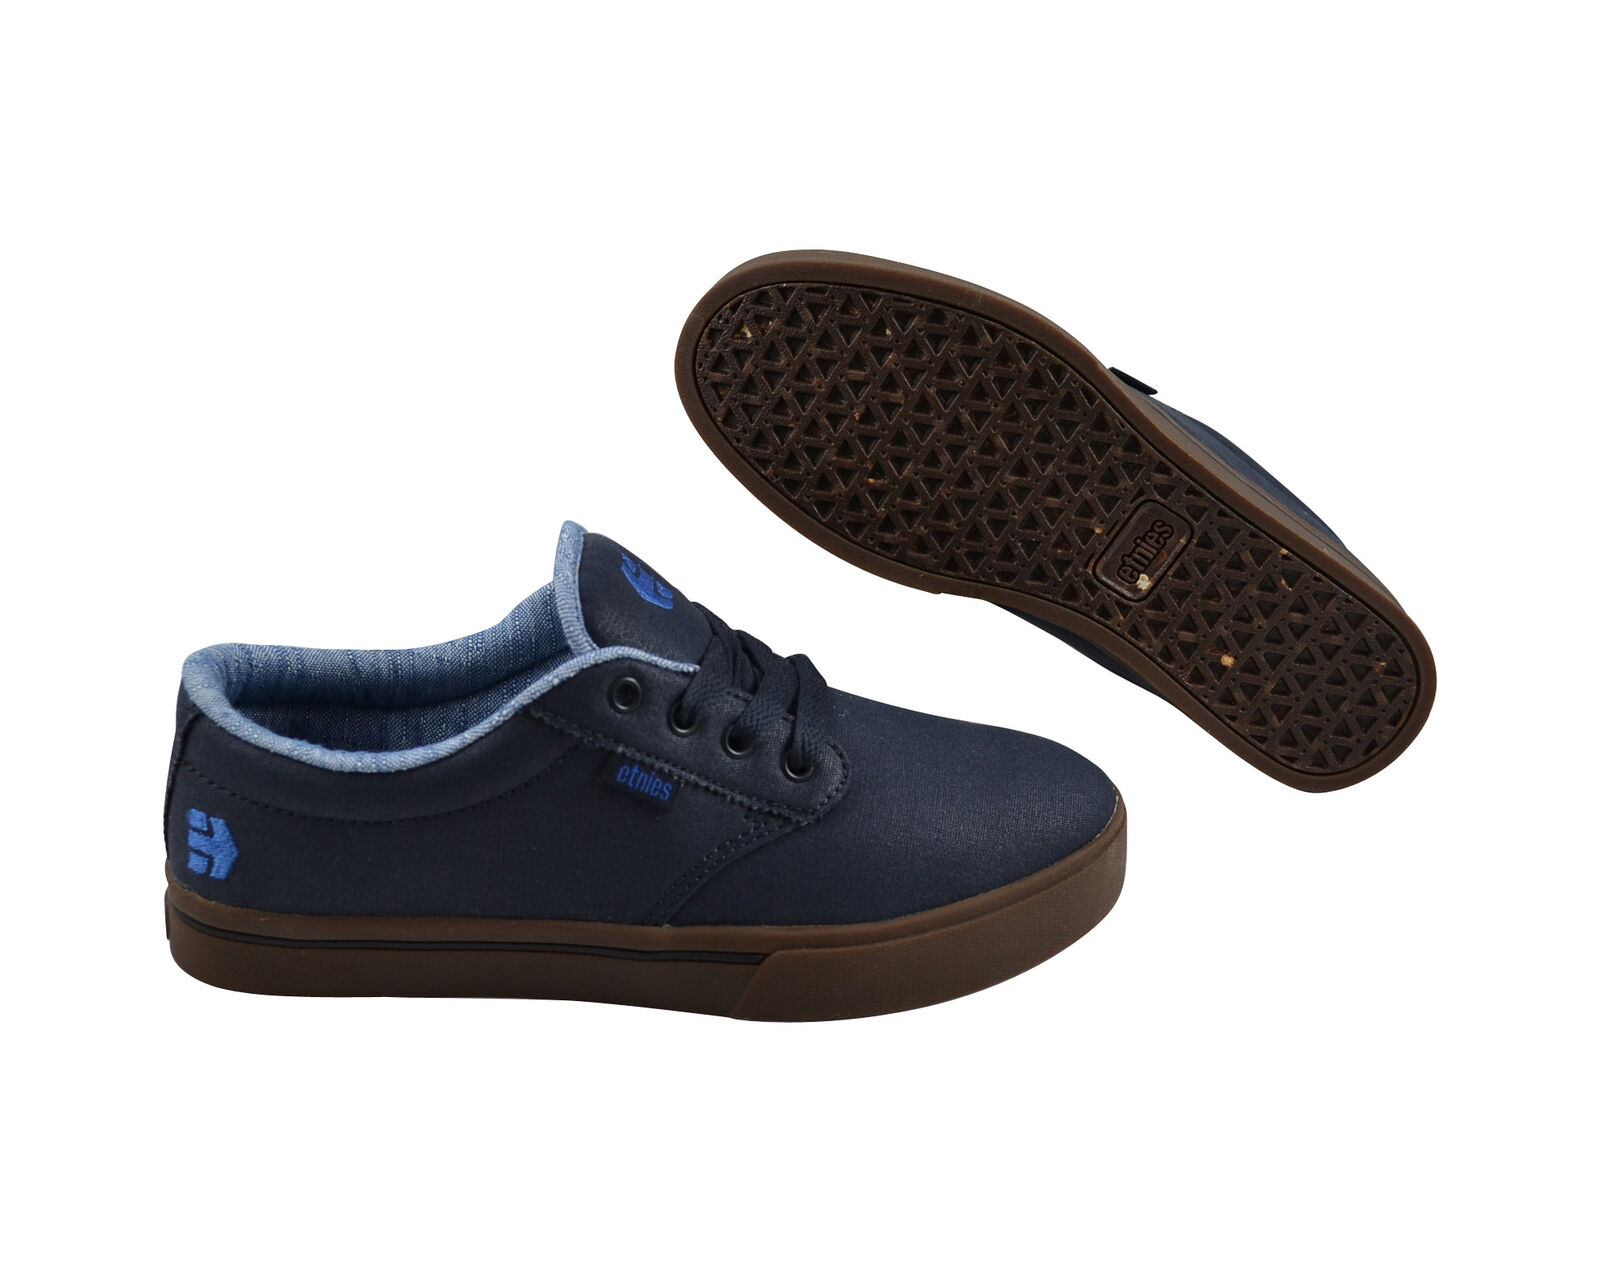 Etnies Etnies Etnies Jameson 2 ECO navy Blau Skater Turnschuhe Schuhe  30806b